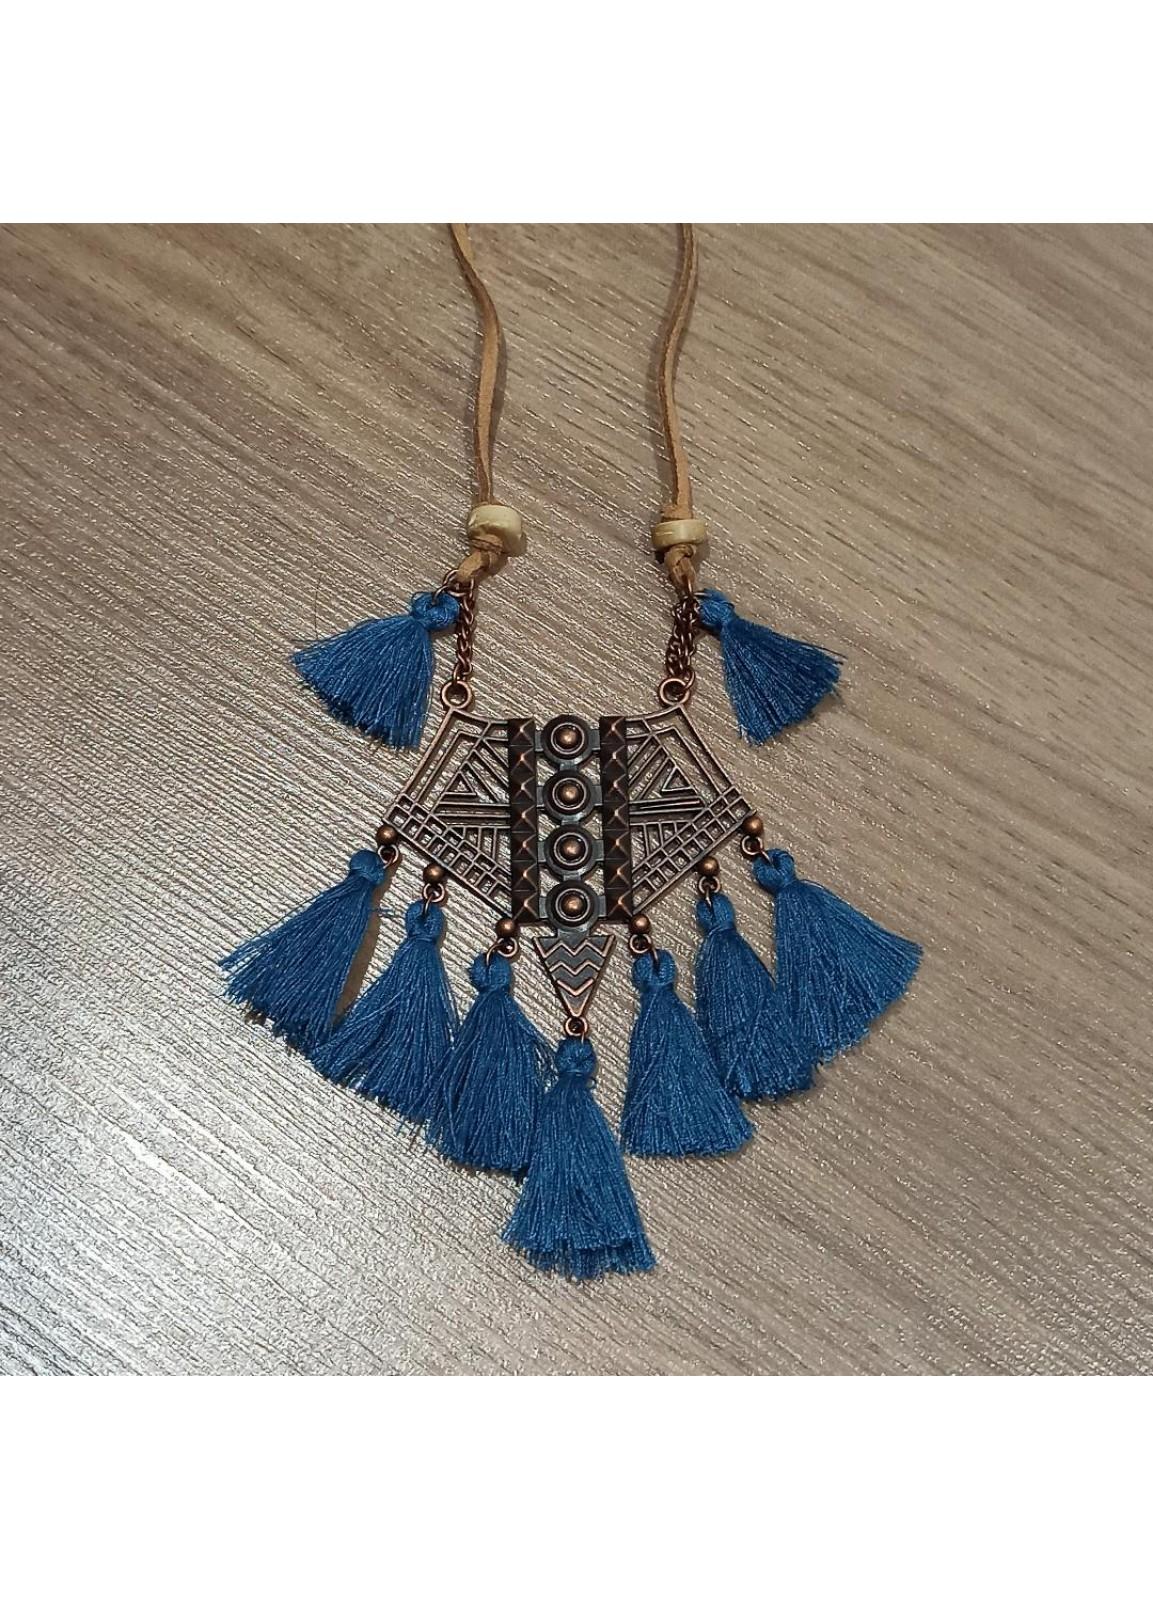 Blue-b Boho Necklace